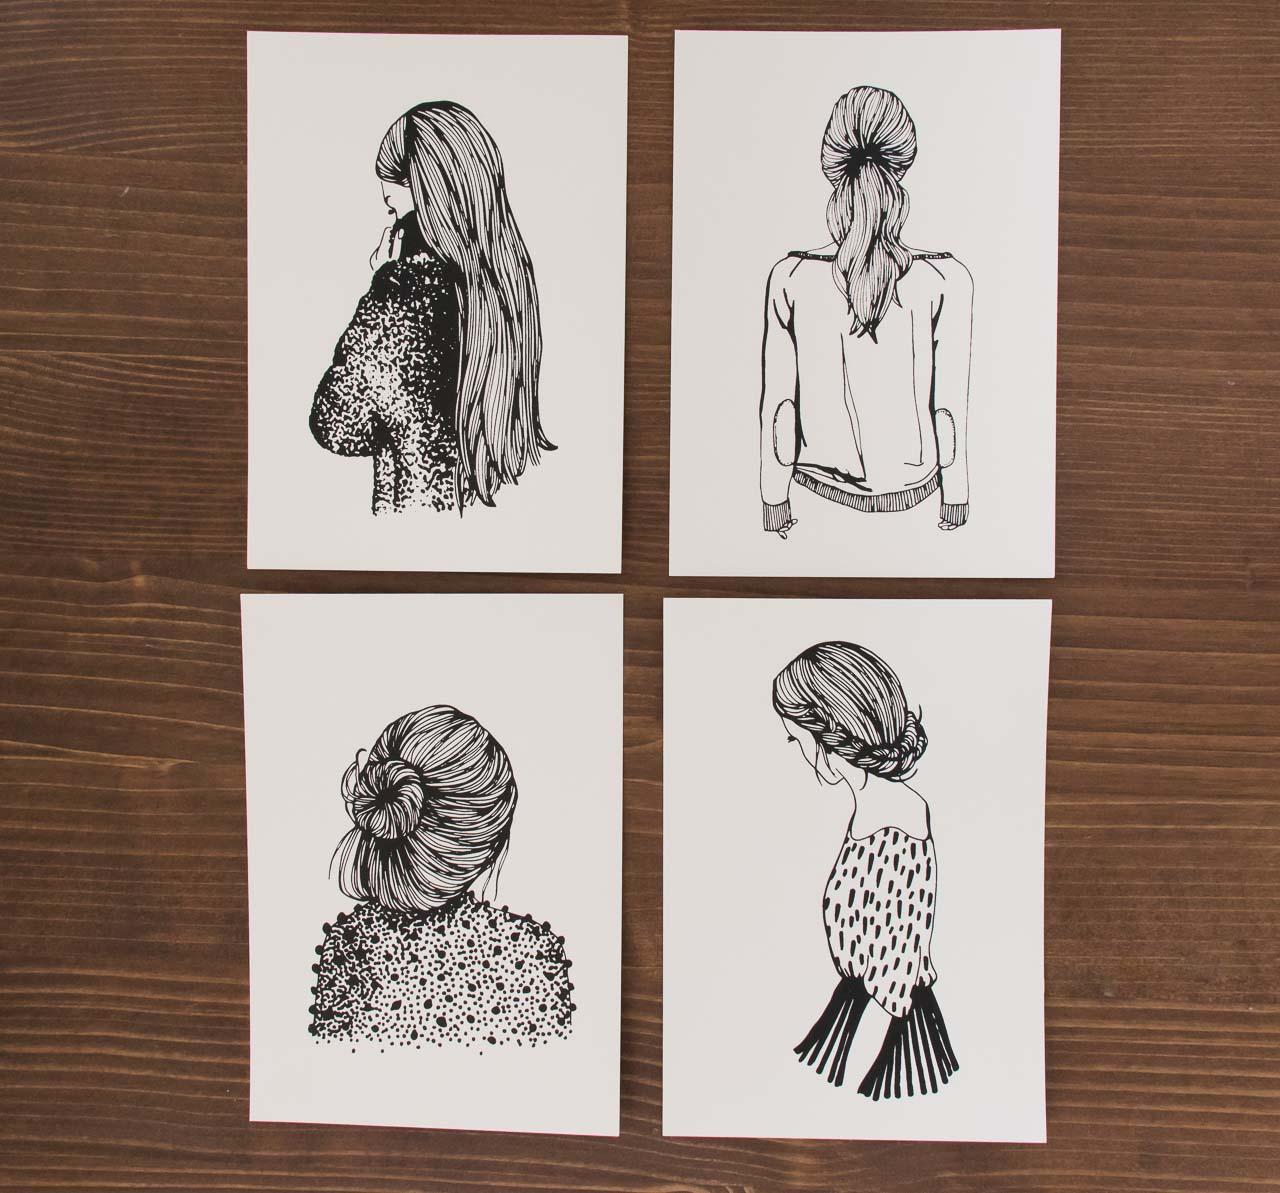 Cartes - Coiffures de Femmes - Rugiada Petrelli -Maison Mathûvû